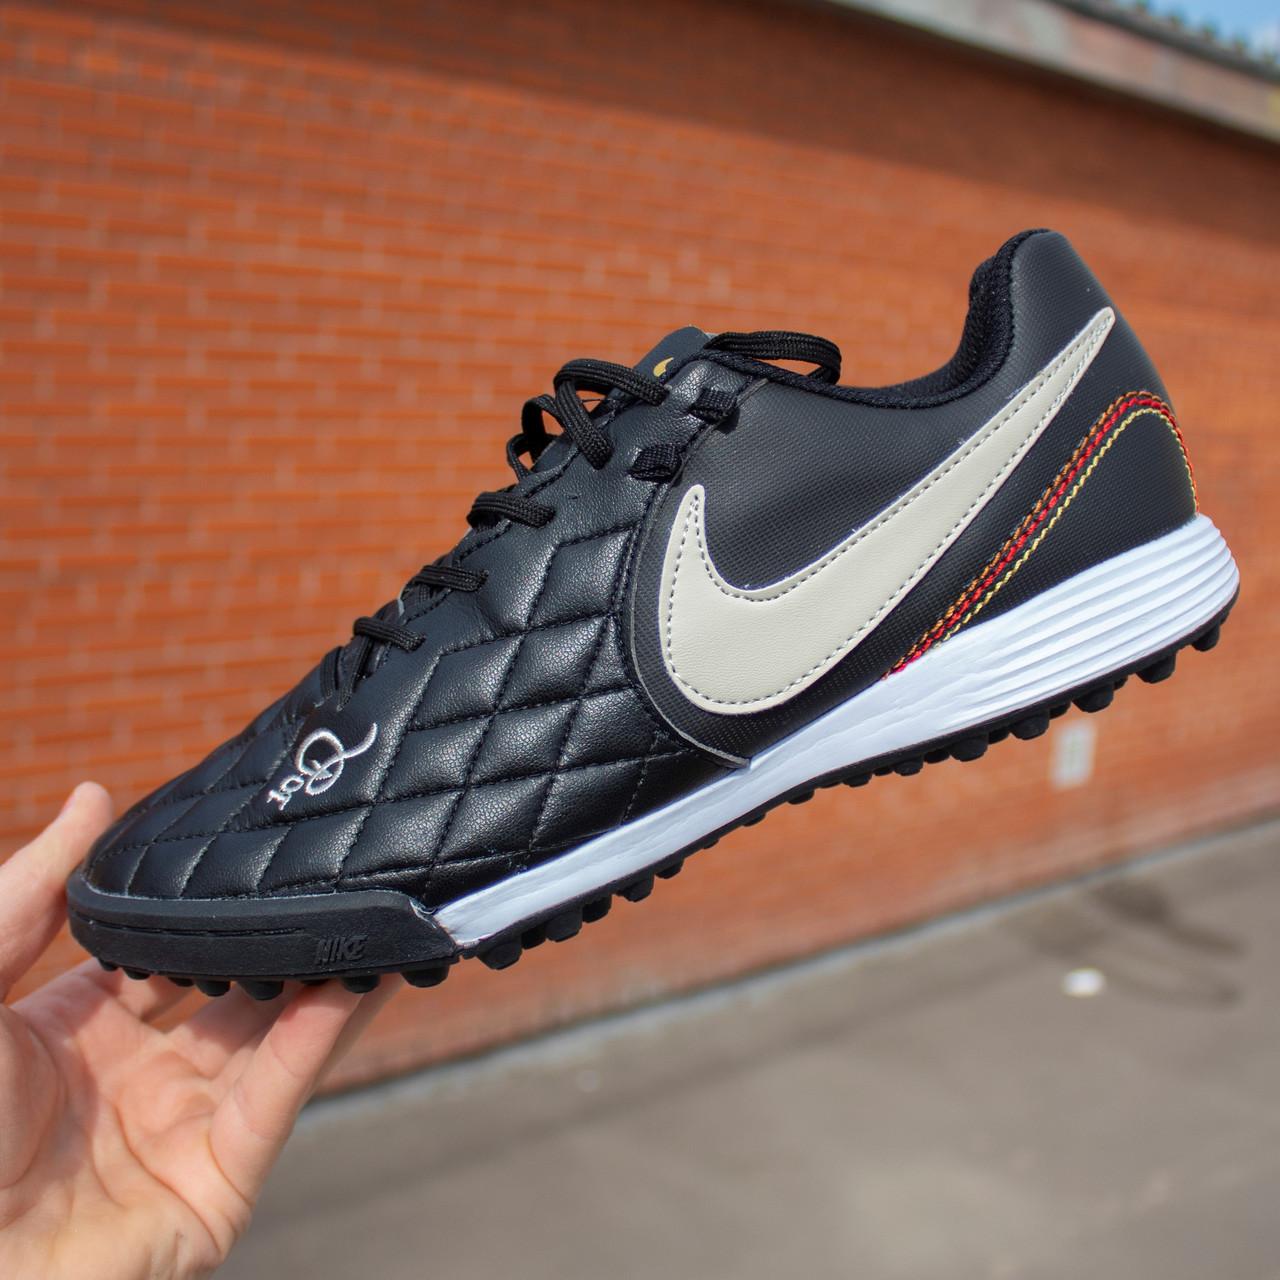 Сороконіжки Nike Tiempo Legend VII Pro R10 TF (39-45)